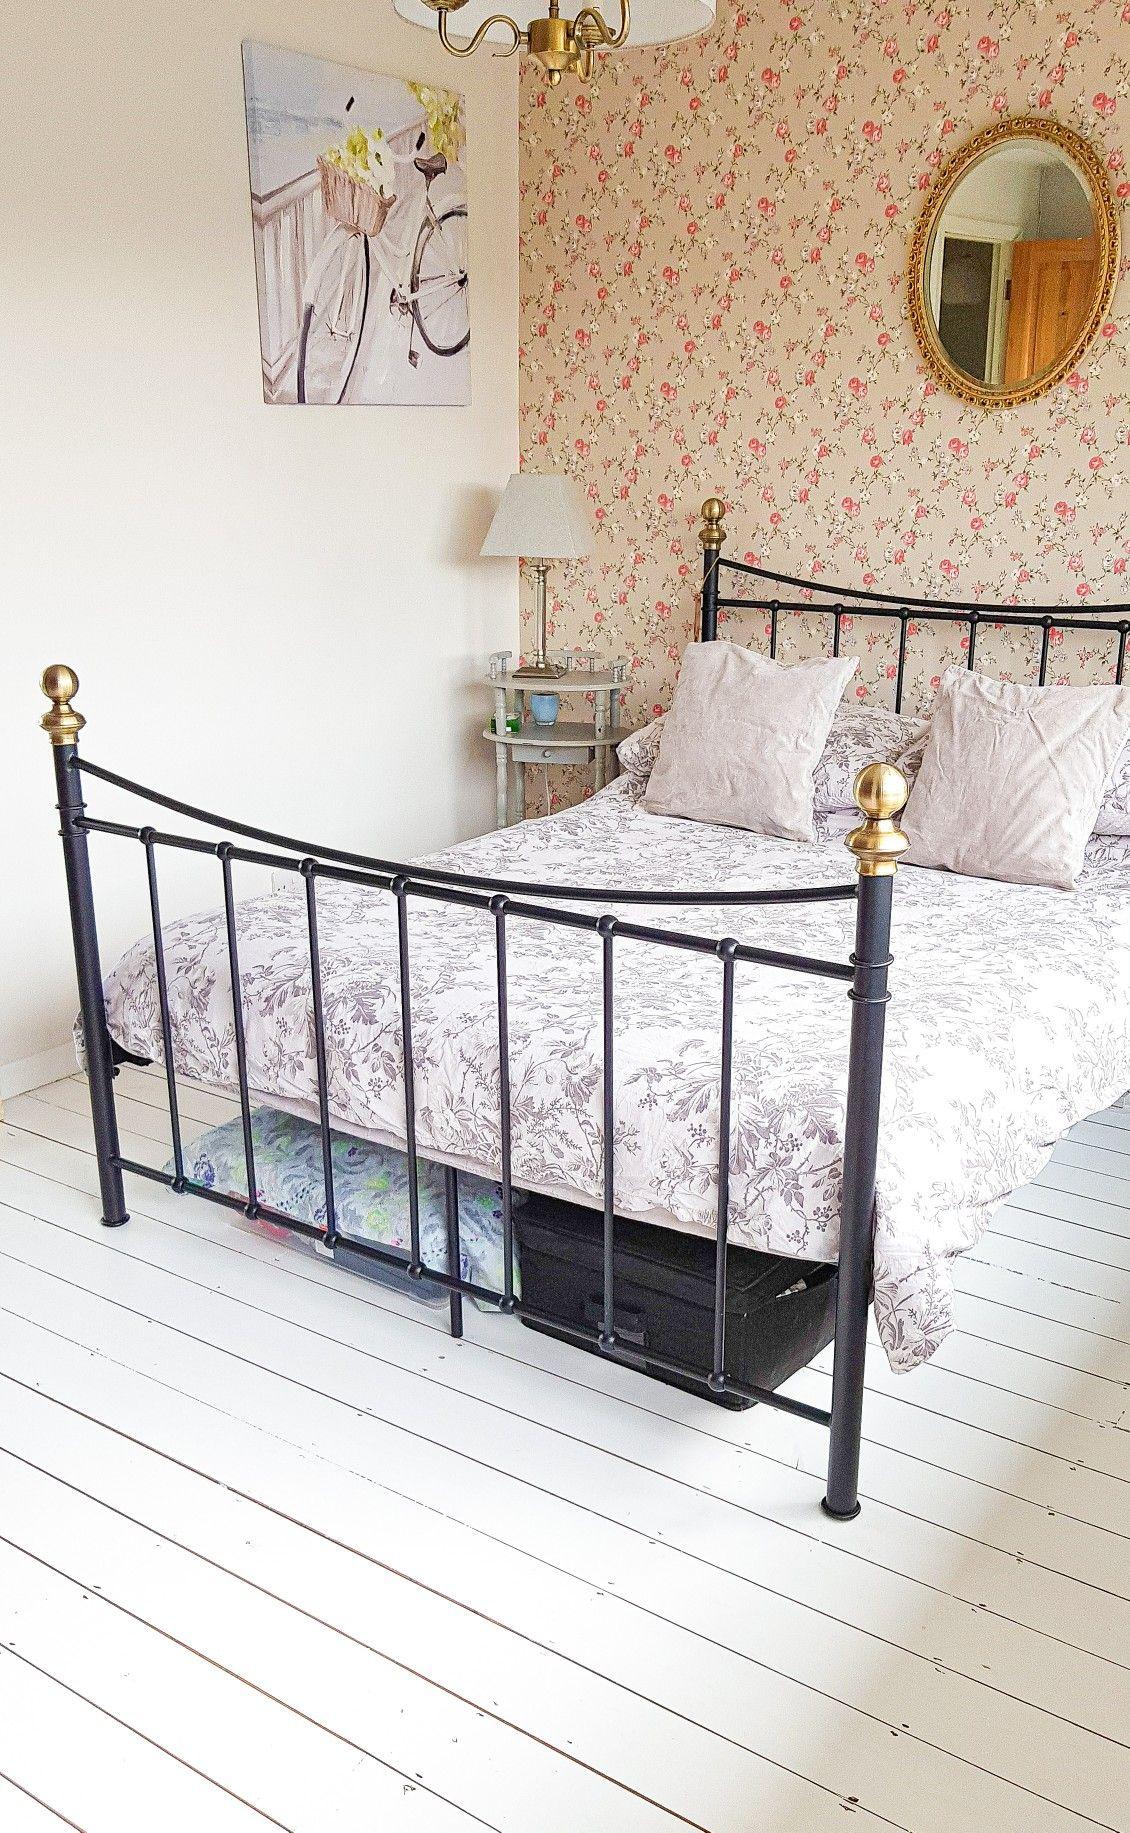 White washed floorboards in bedroom. Floral wallpaper